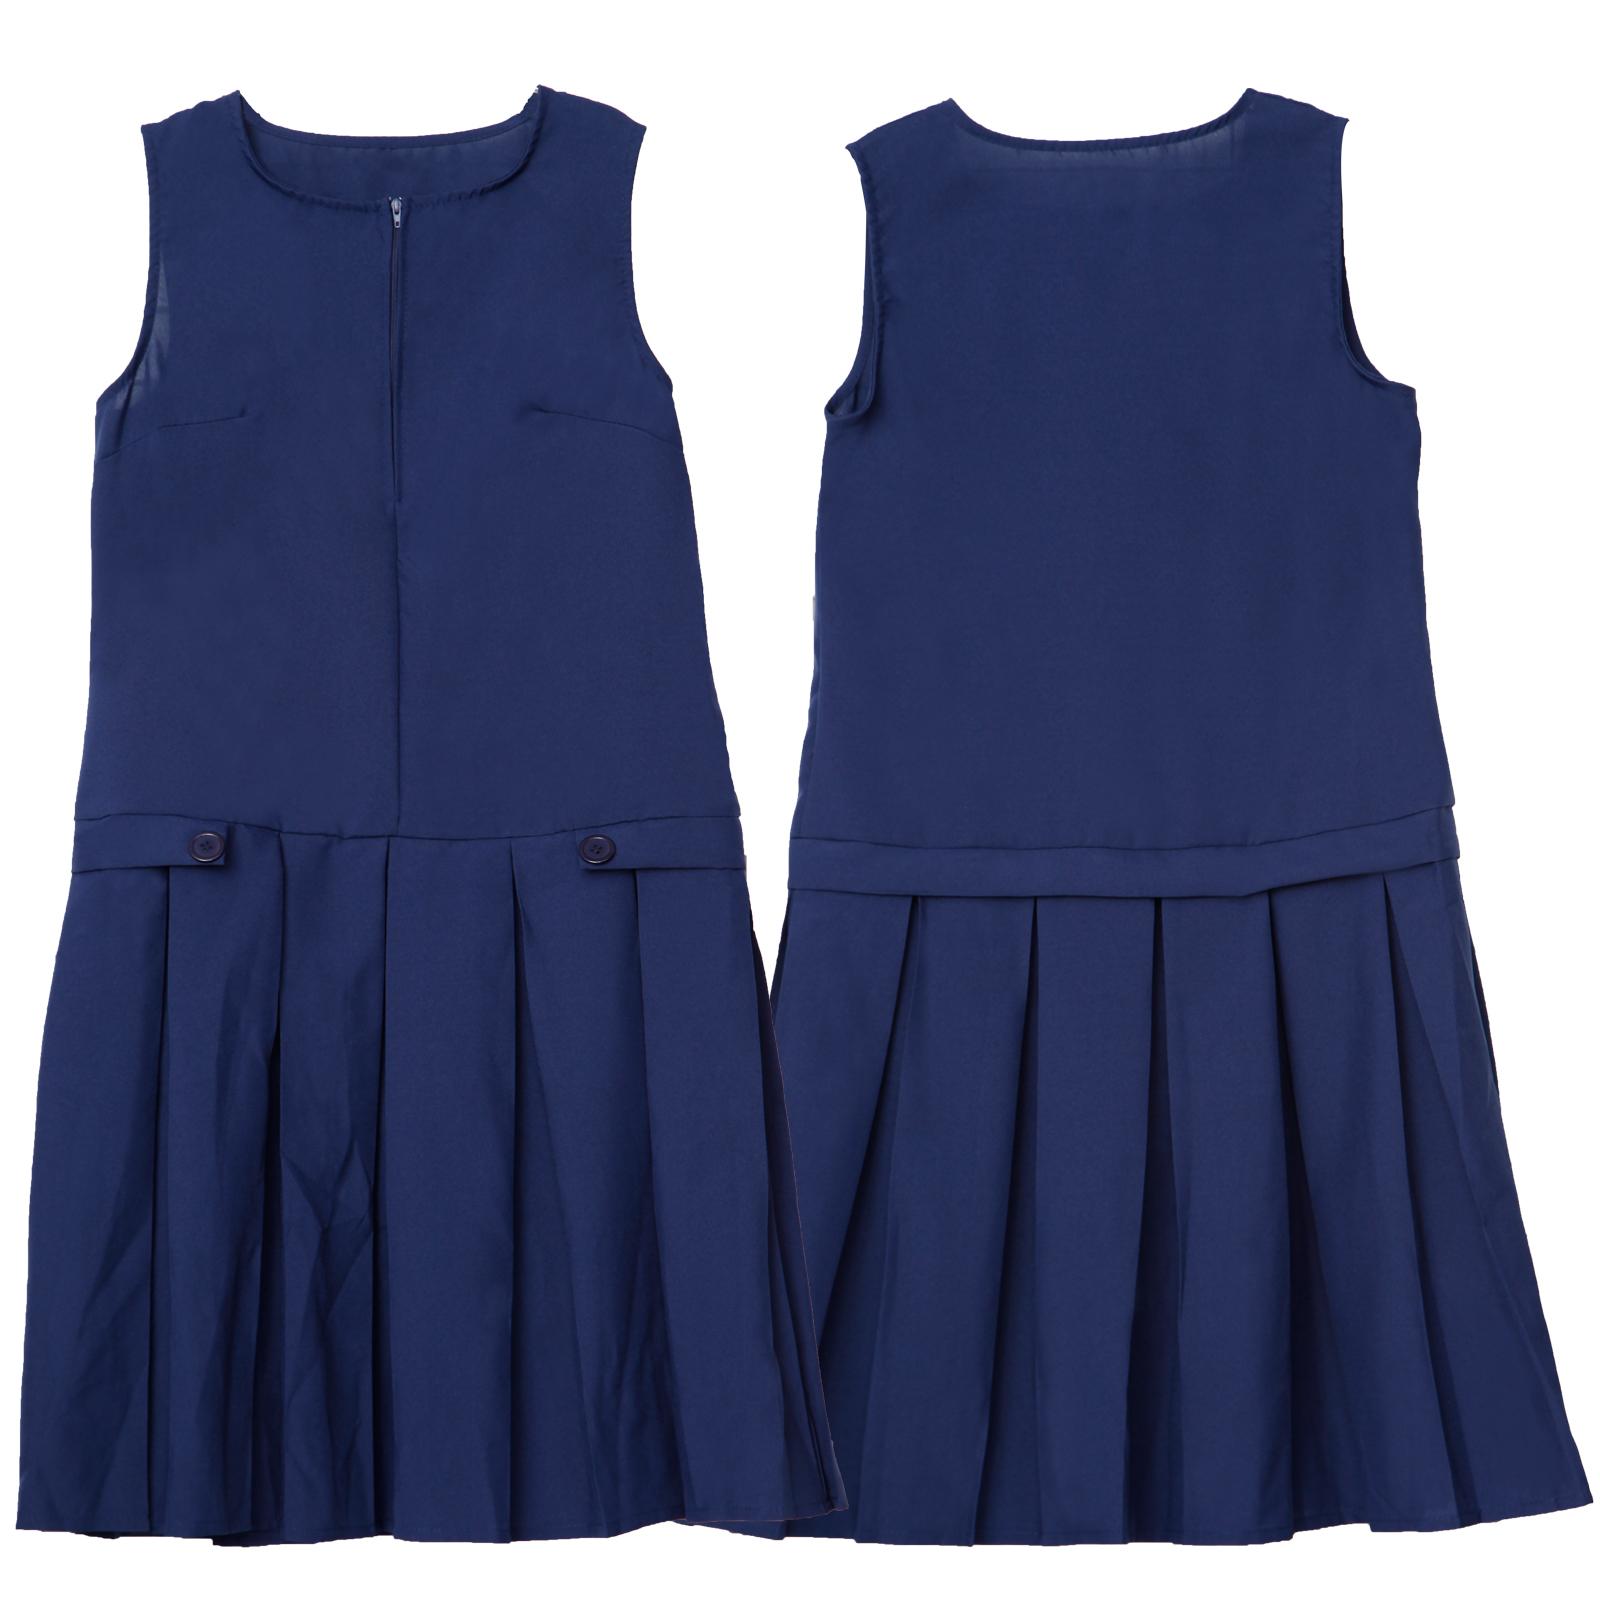 720a855166 Ages 13-16 Girls Kids Summer Pinafore School Pleated Dress Uniform Grey  Black | eBay